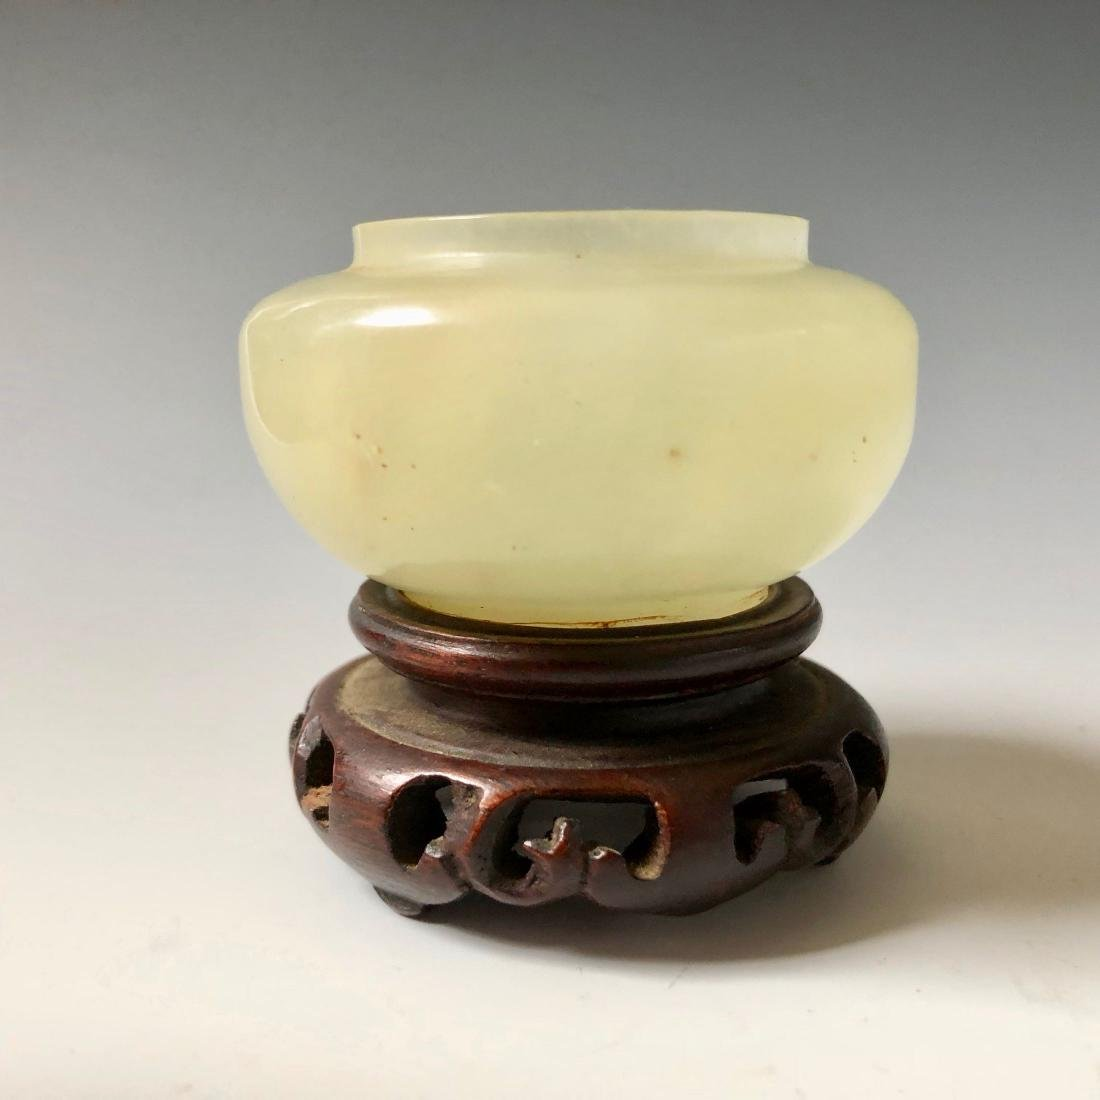 CHINESE ANTIQUE JADE BOWL, 18C - 5